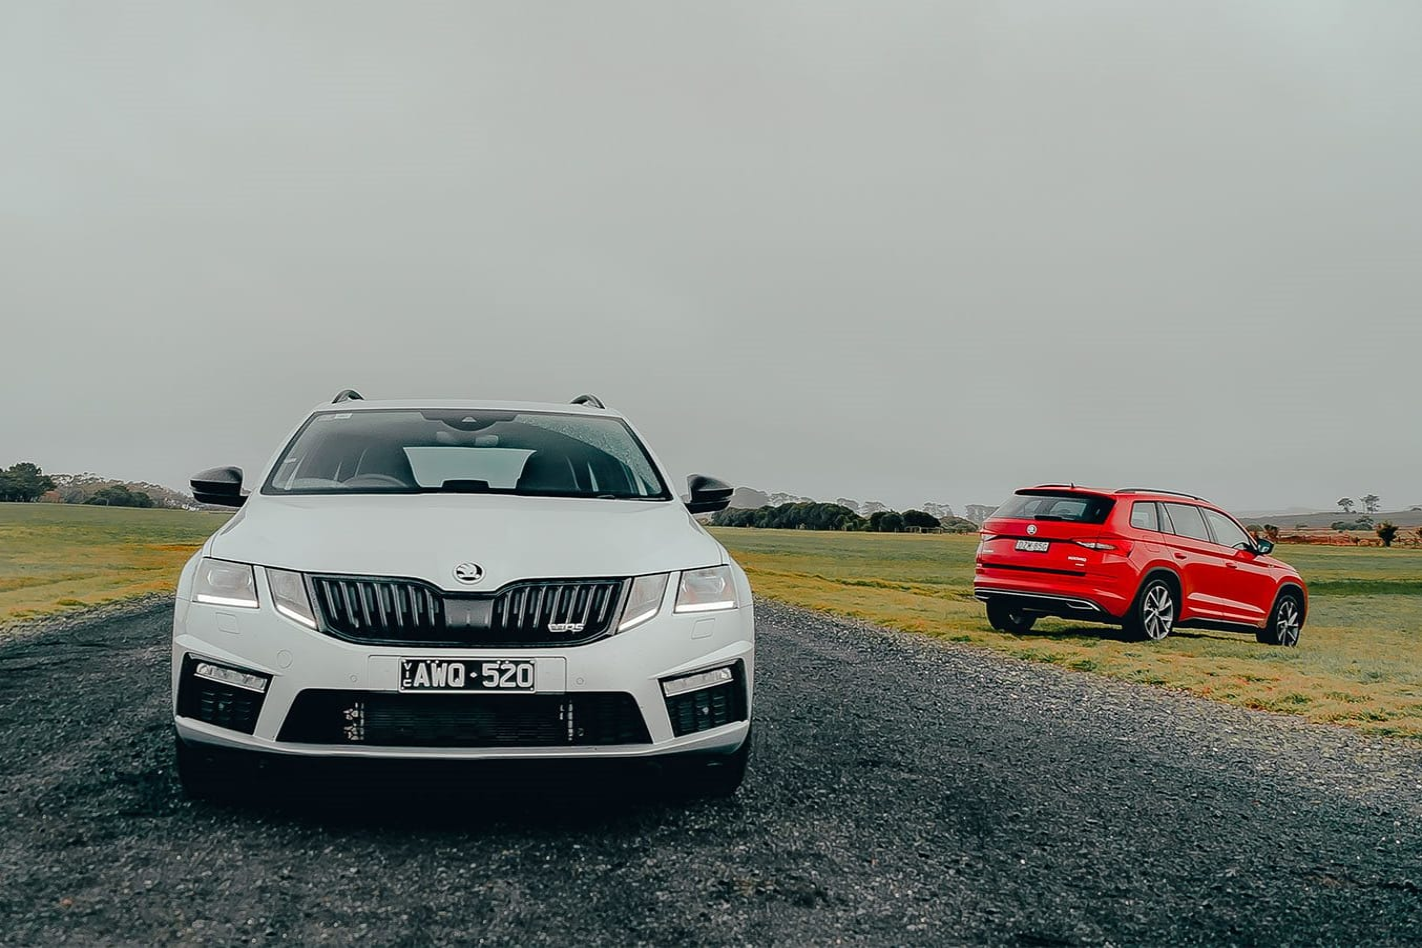 Skoda Octavia wagon vs Kodiaq SUV